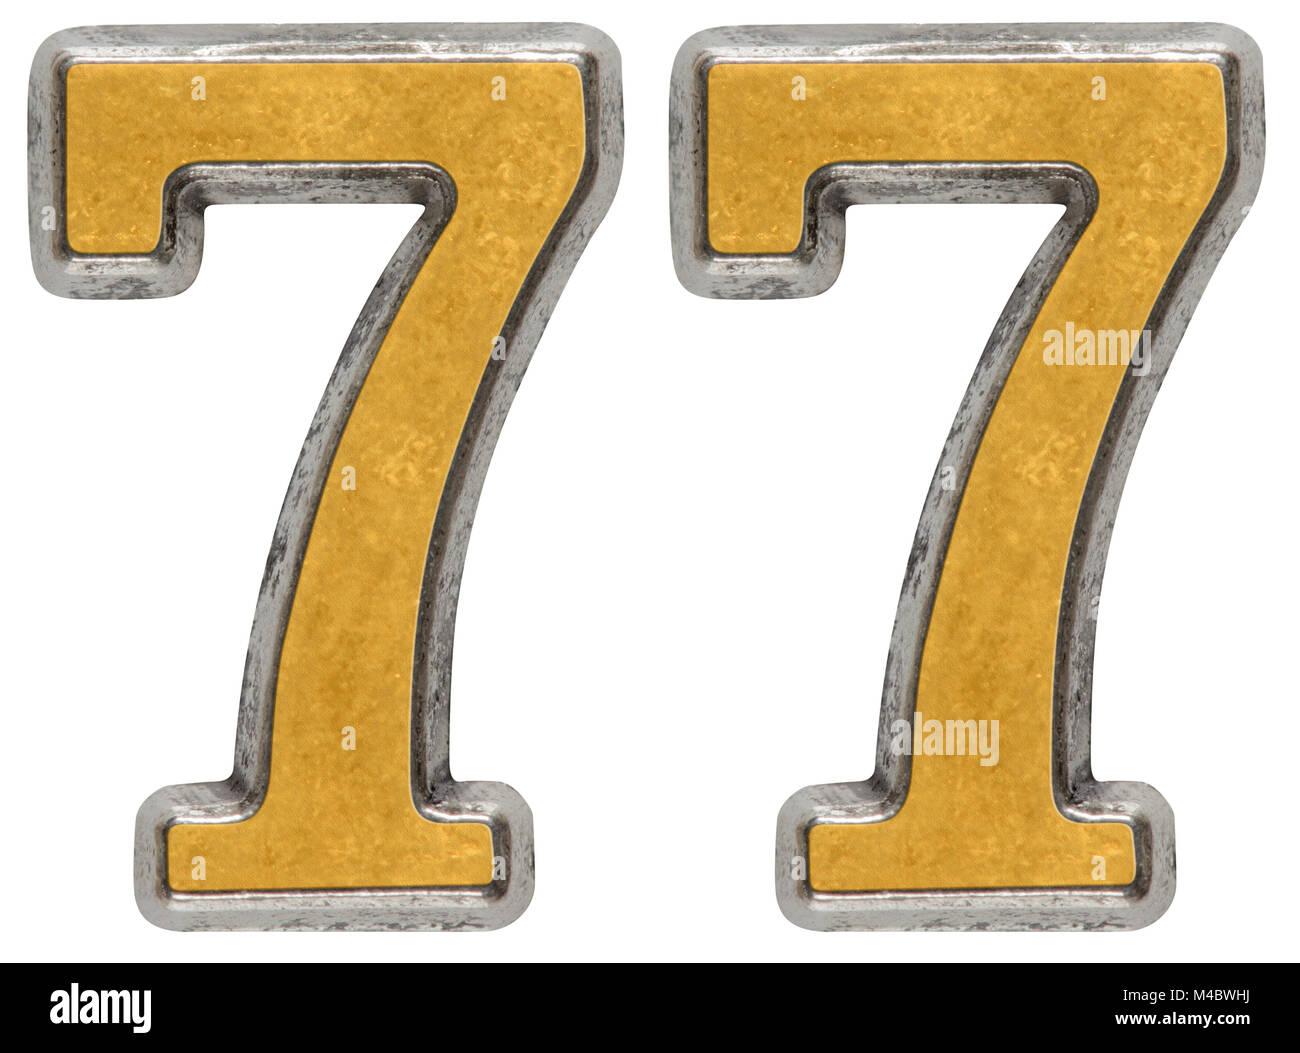 Metal numeral 77, seventy-sevendigit; isolated on white background - Stock Image